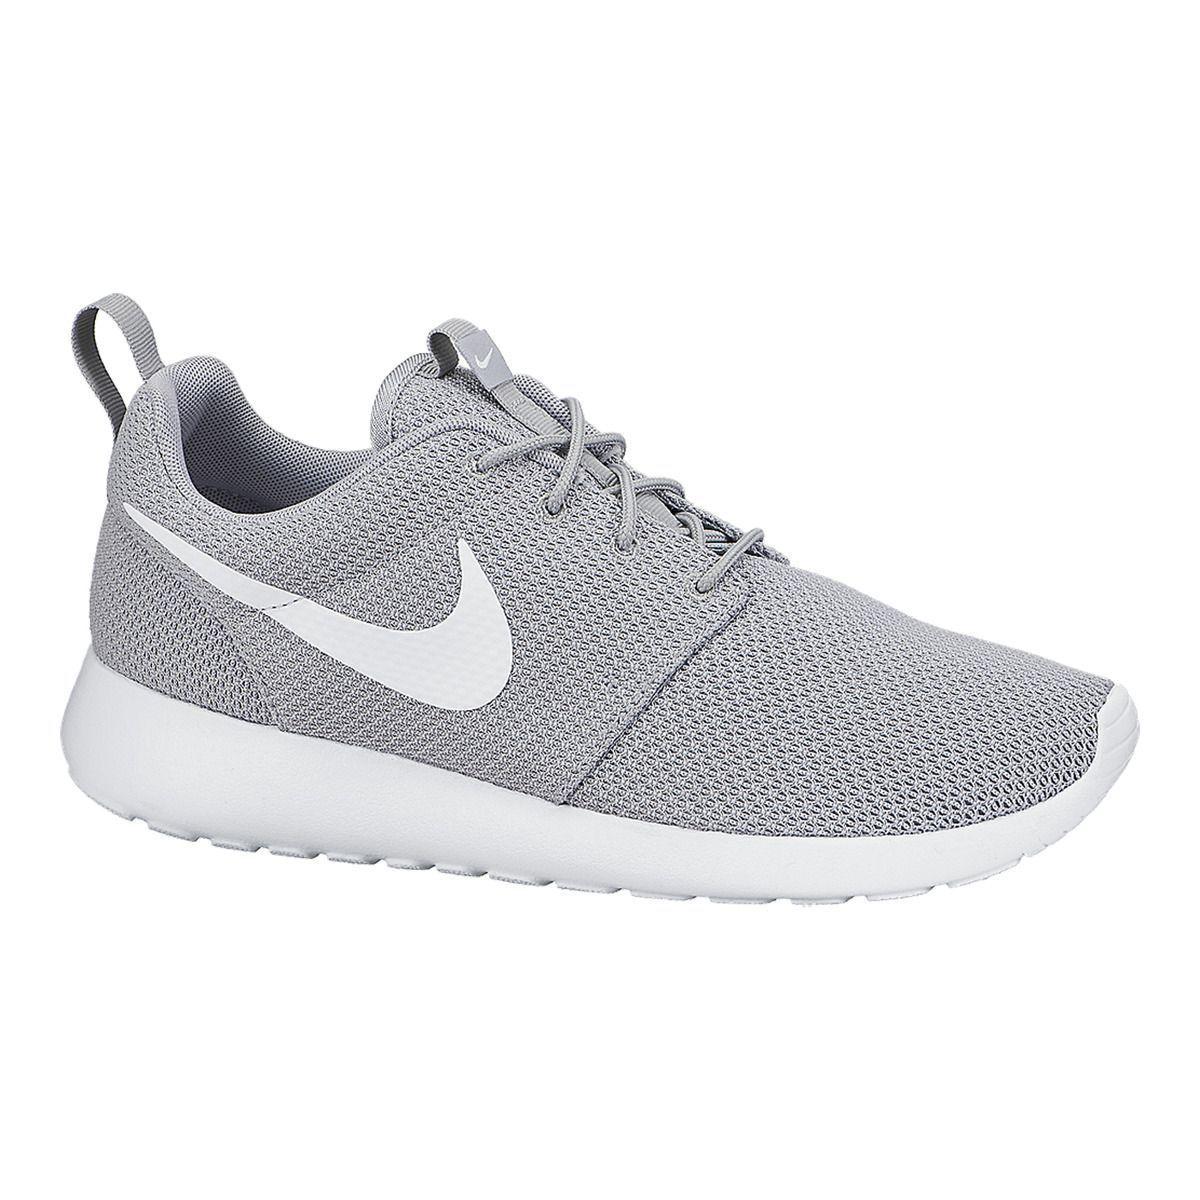 differently ea0a8 64fac Zapatillas casual de hombre Roshe One Nike